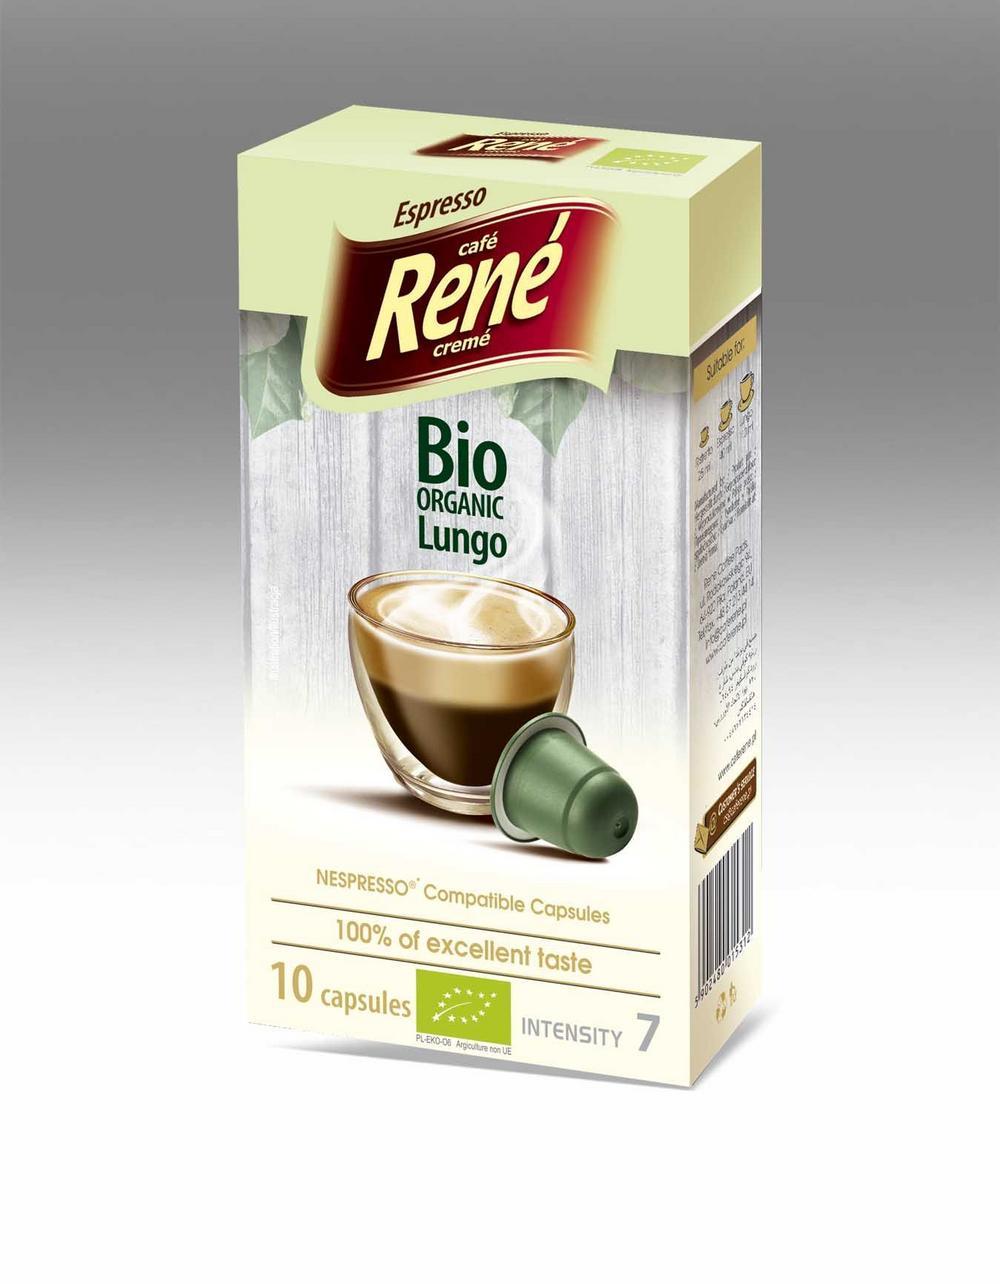 Café Rene Nespresso Compatible Capsules - Bio Organic Lungo 10 Capsules